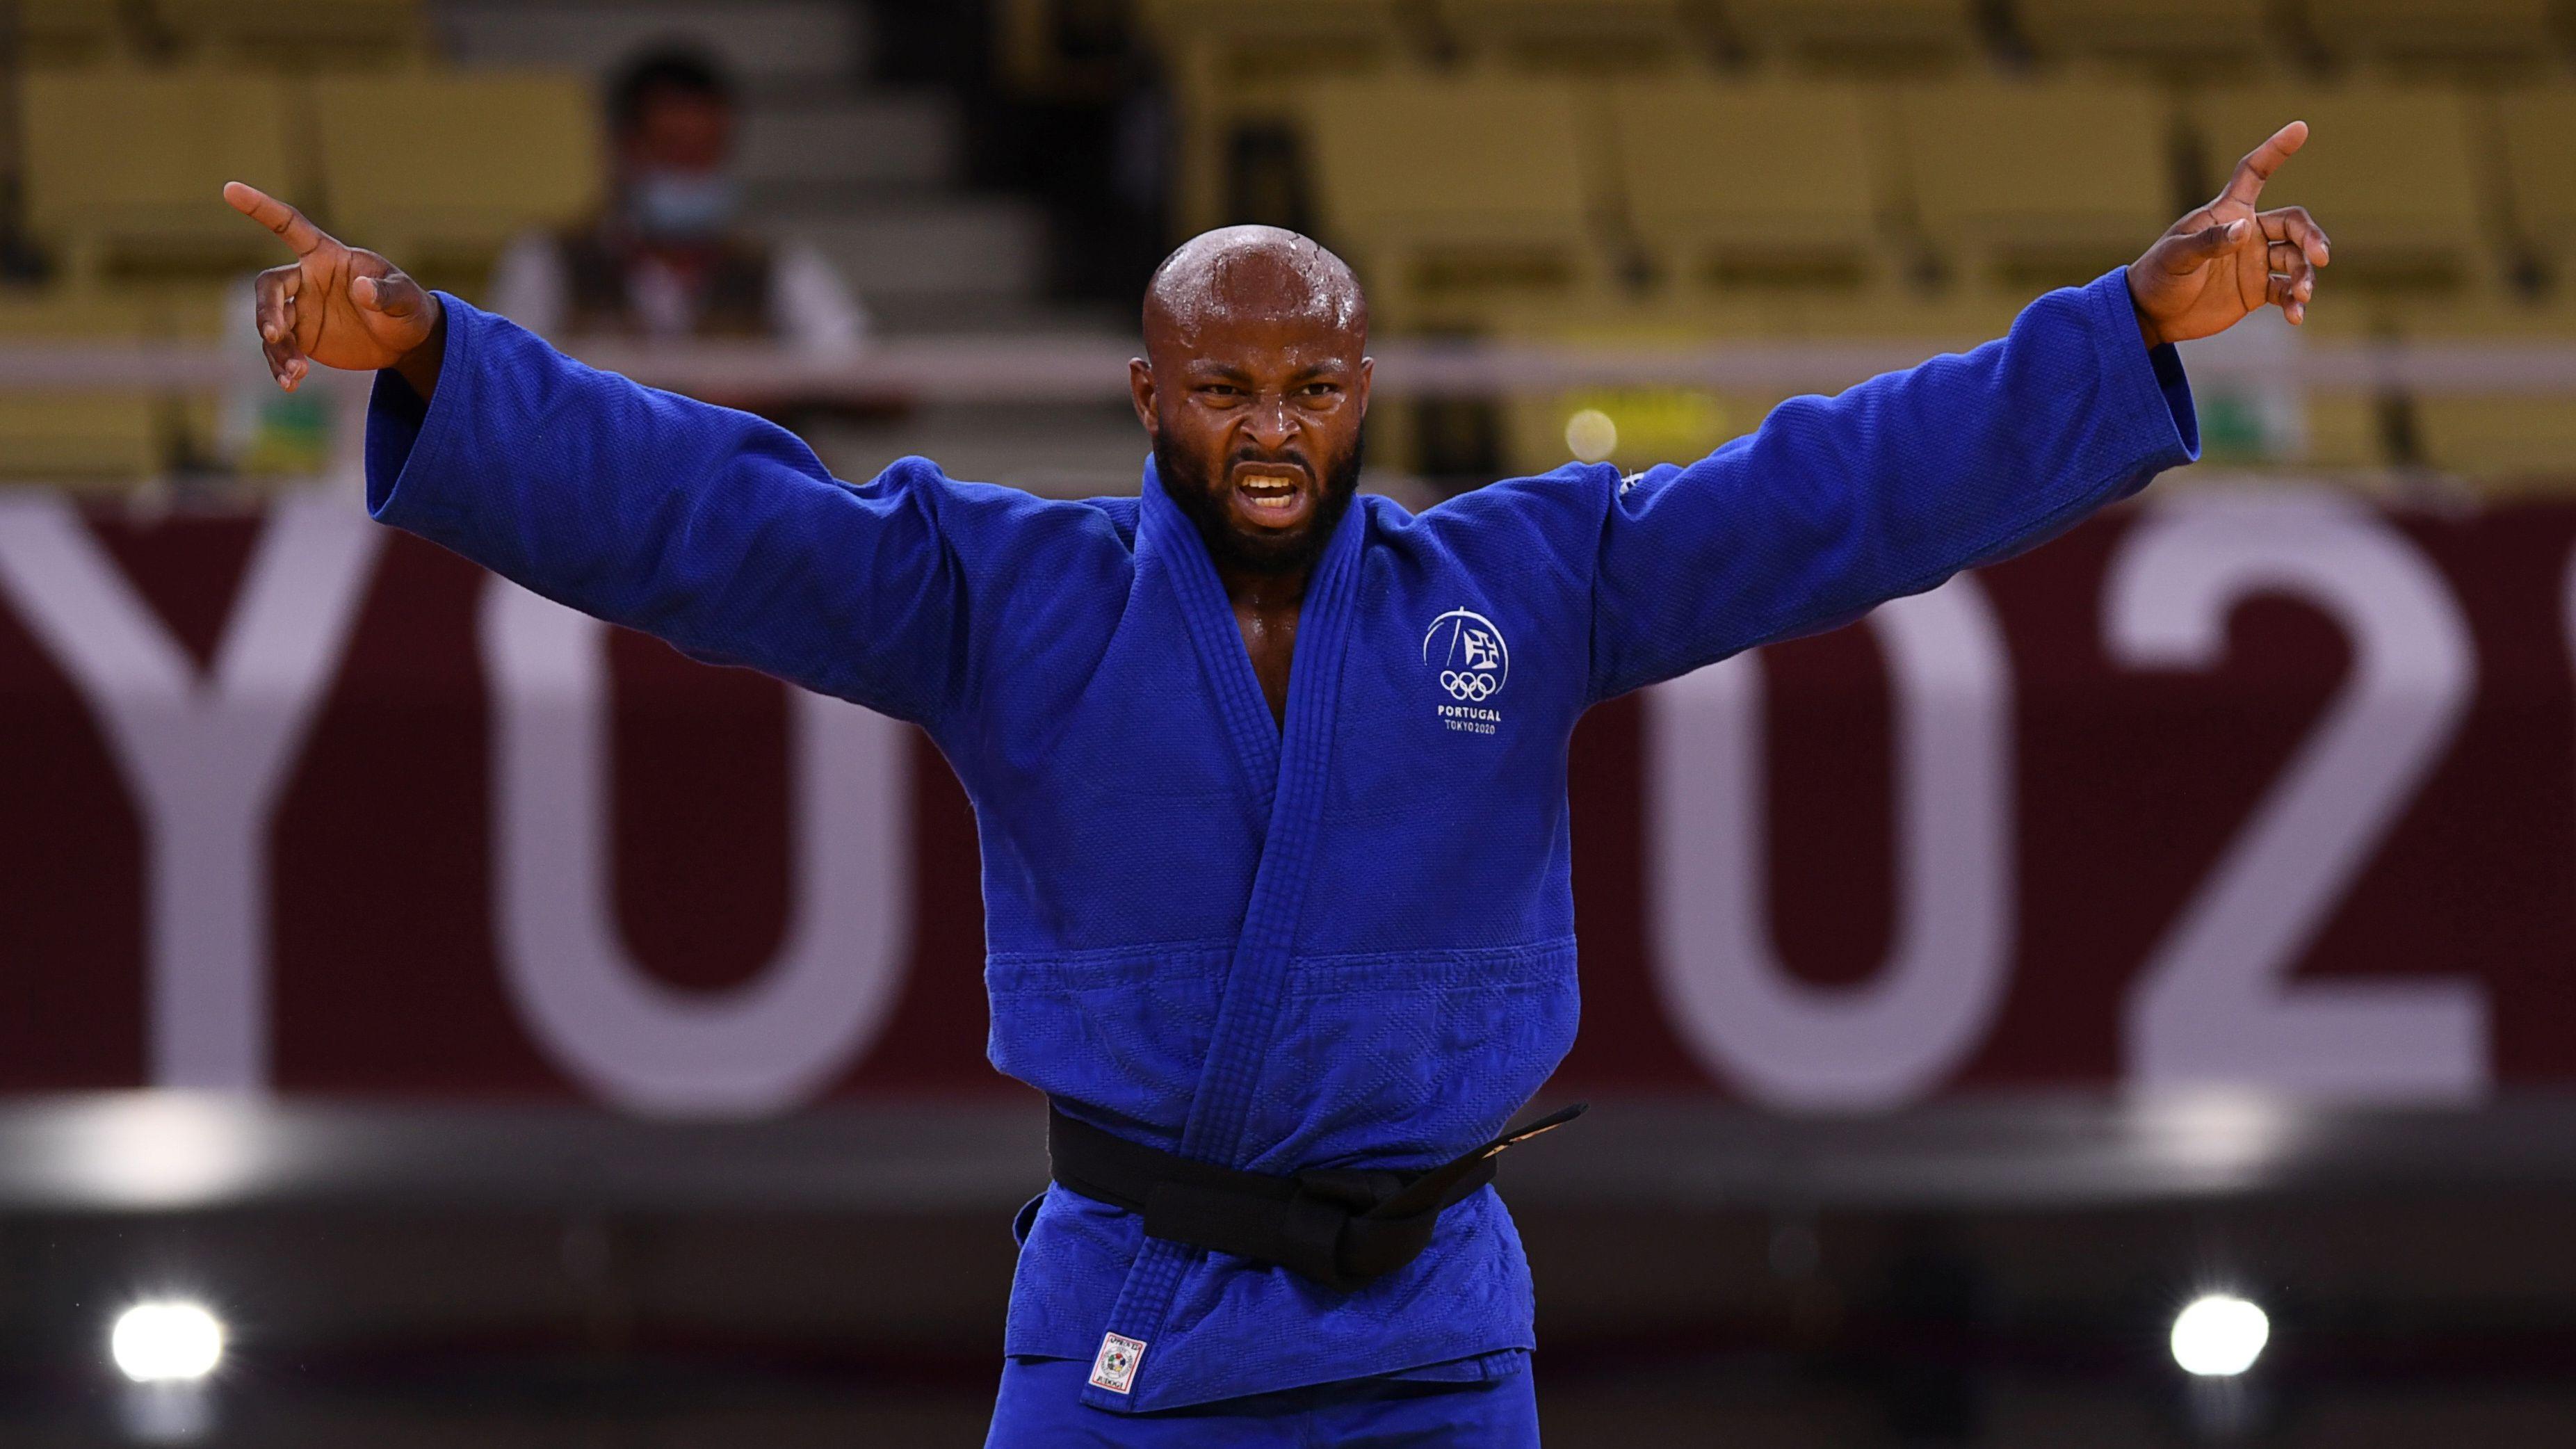 Fonseca celebra su primera medalla olímpica (REUTERS/Annegret Hilse)